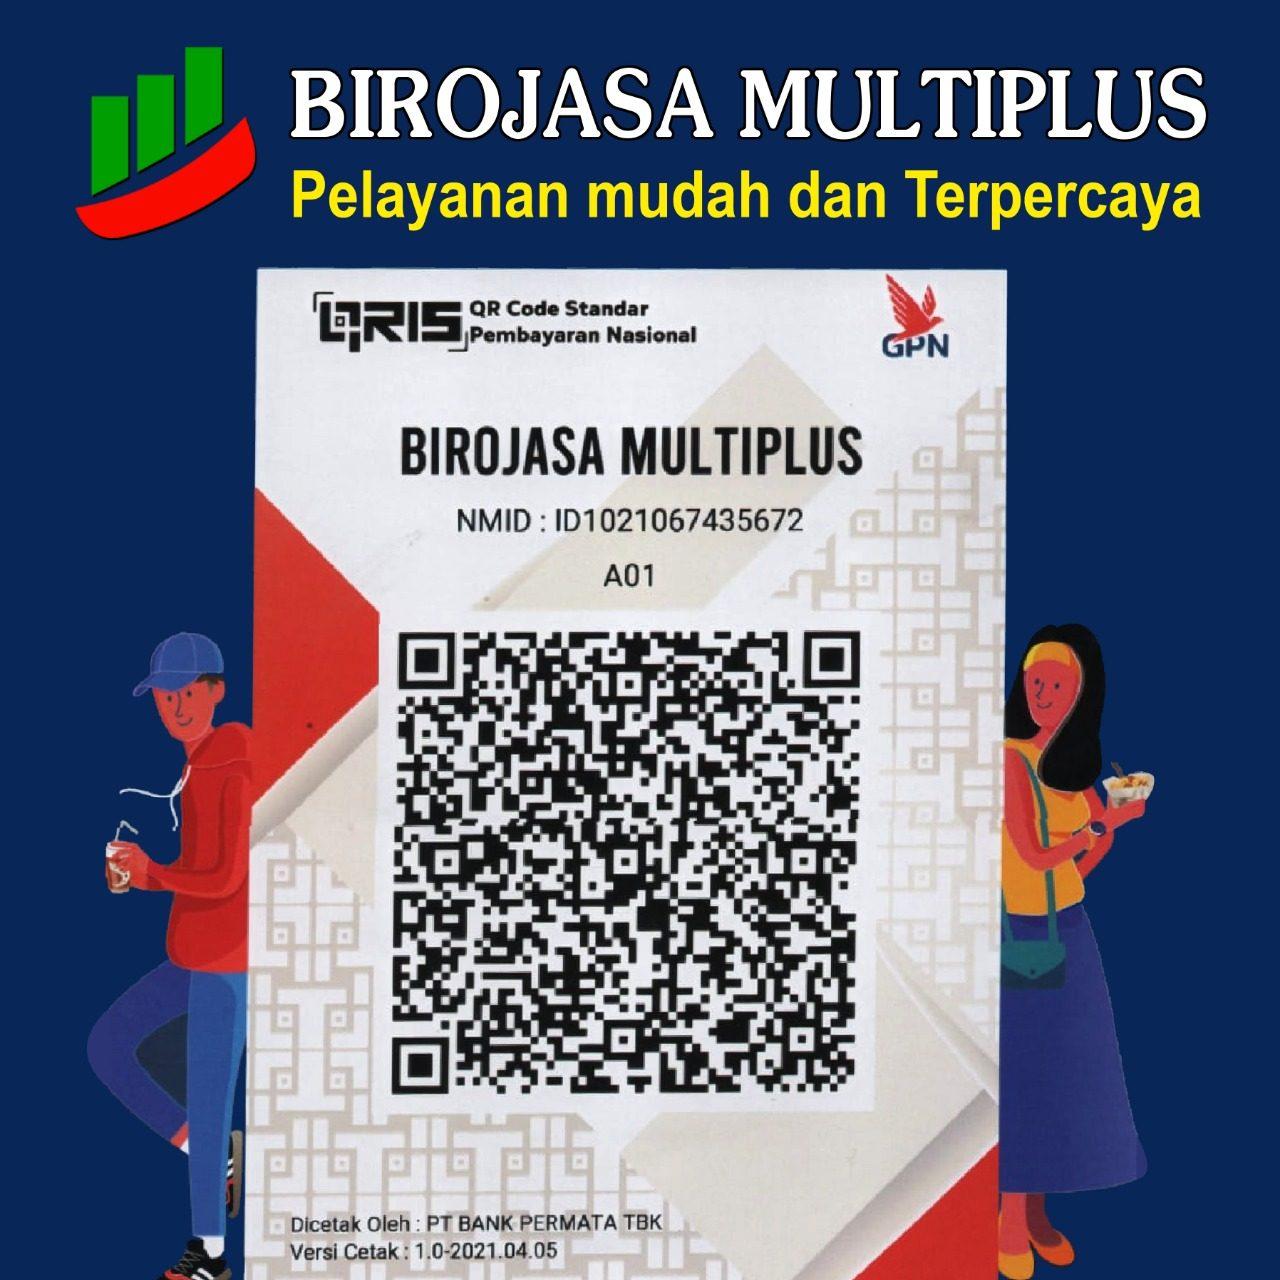 Birojasa Multiplus